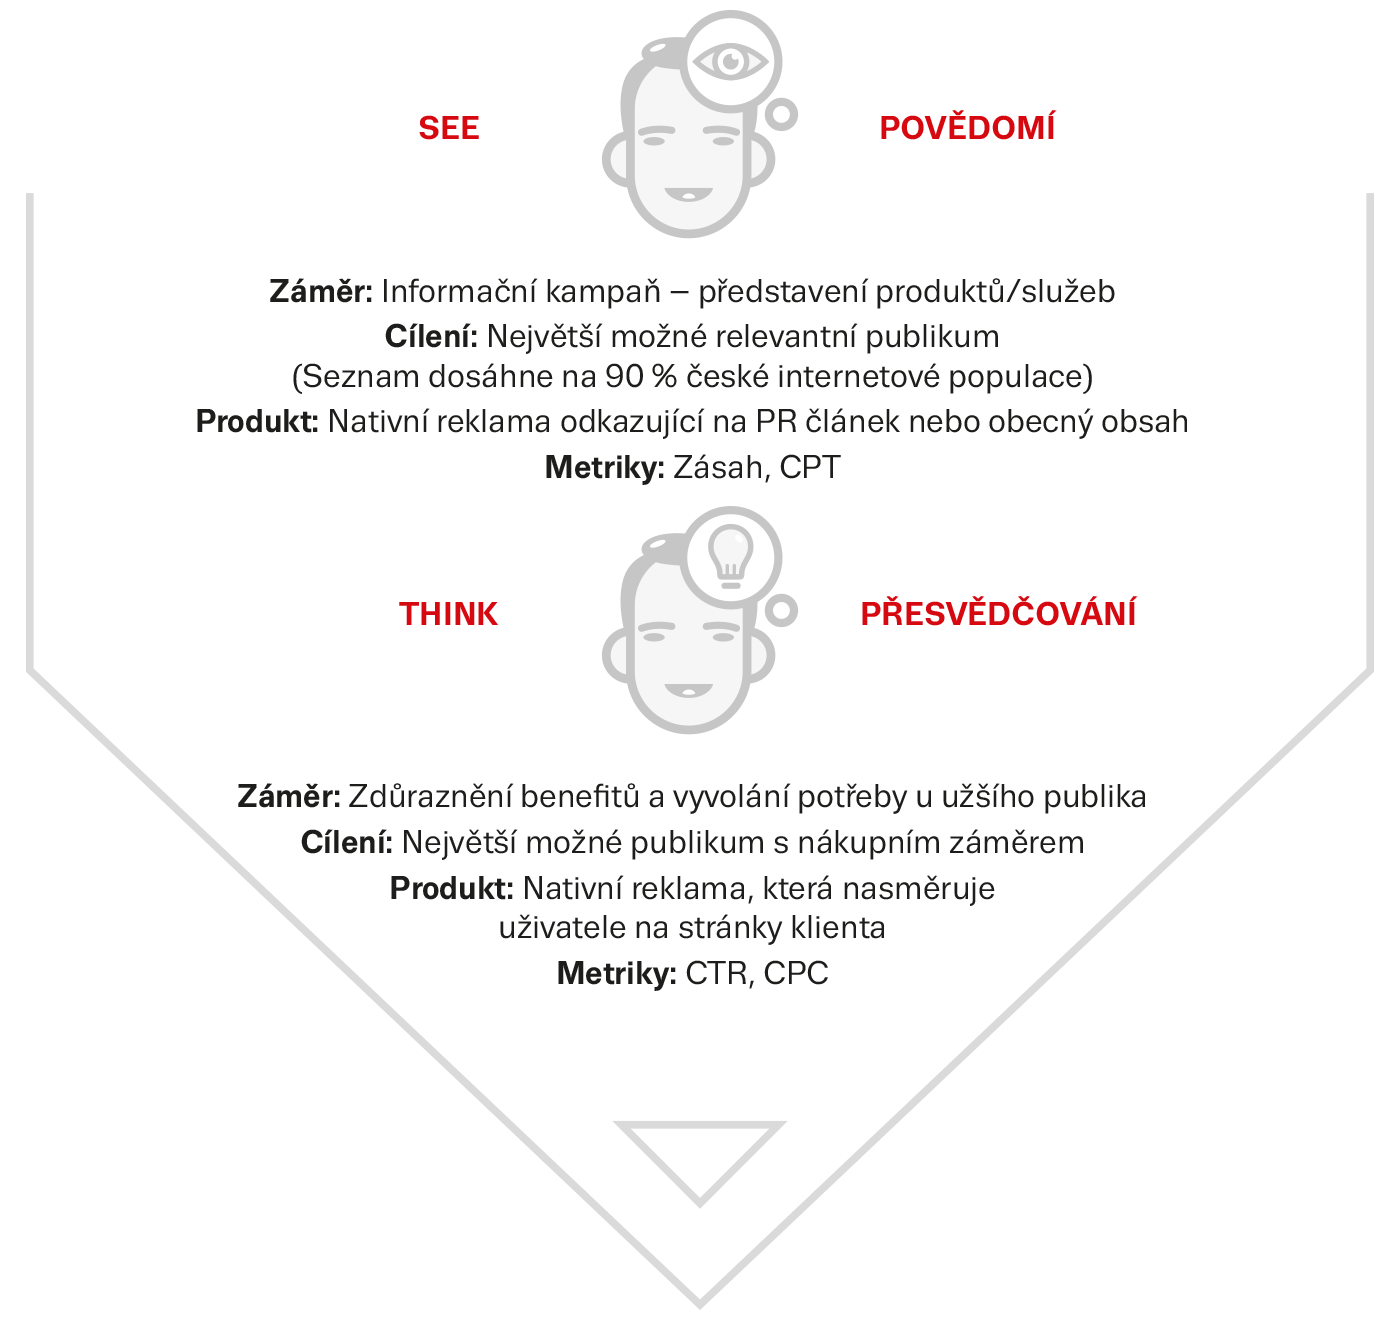 Obrazek: vyobrazeni dvou fazi